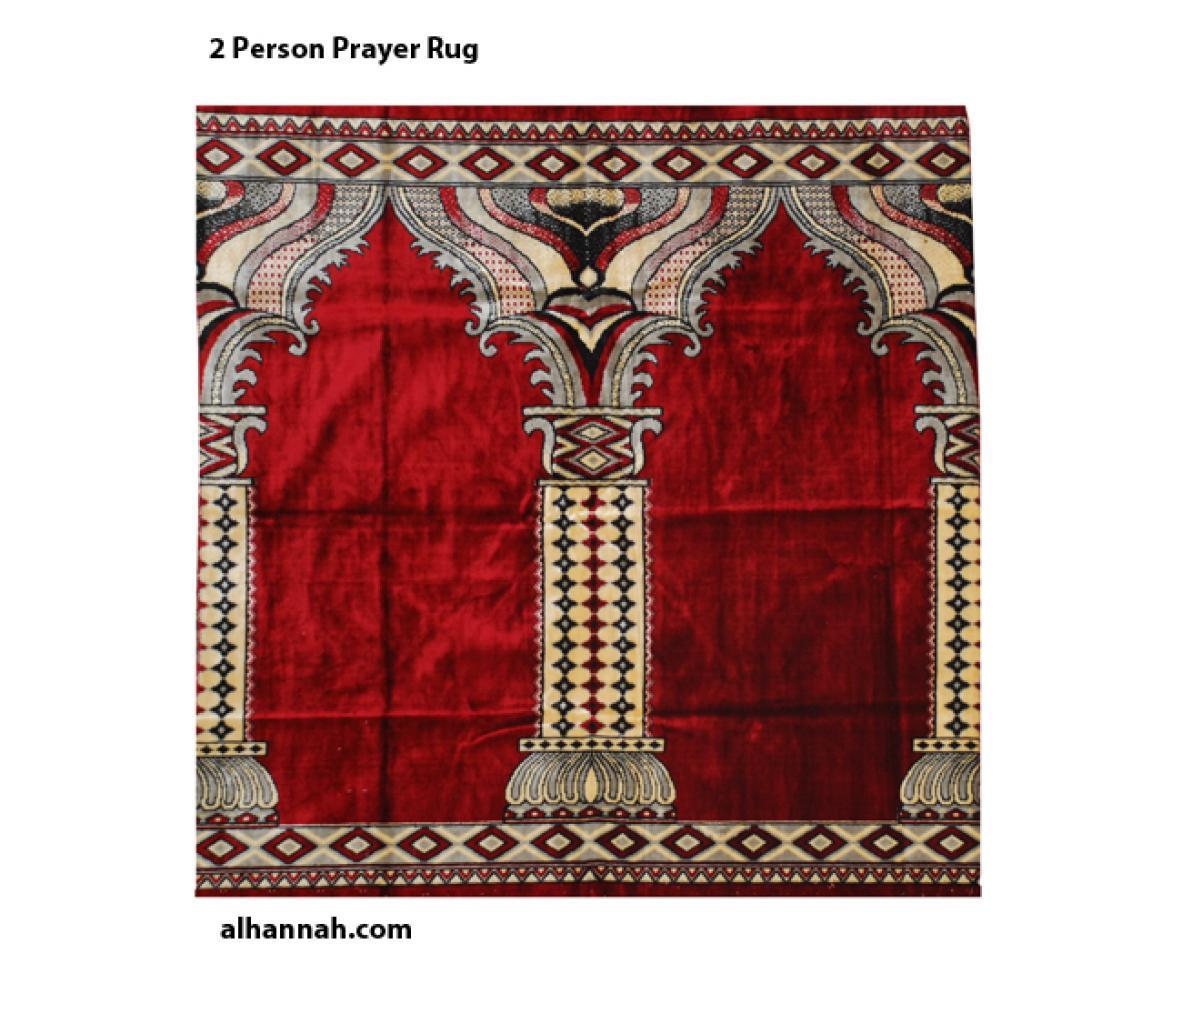 2 Person Prayer Rug ii1022